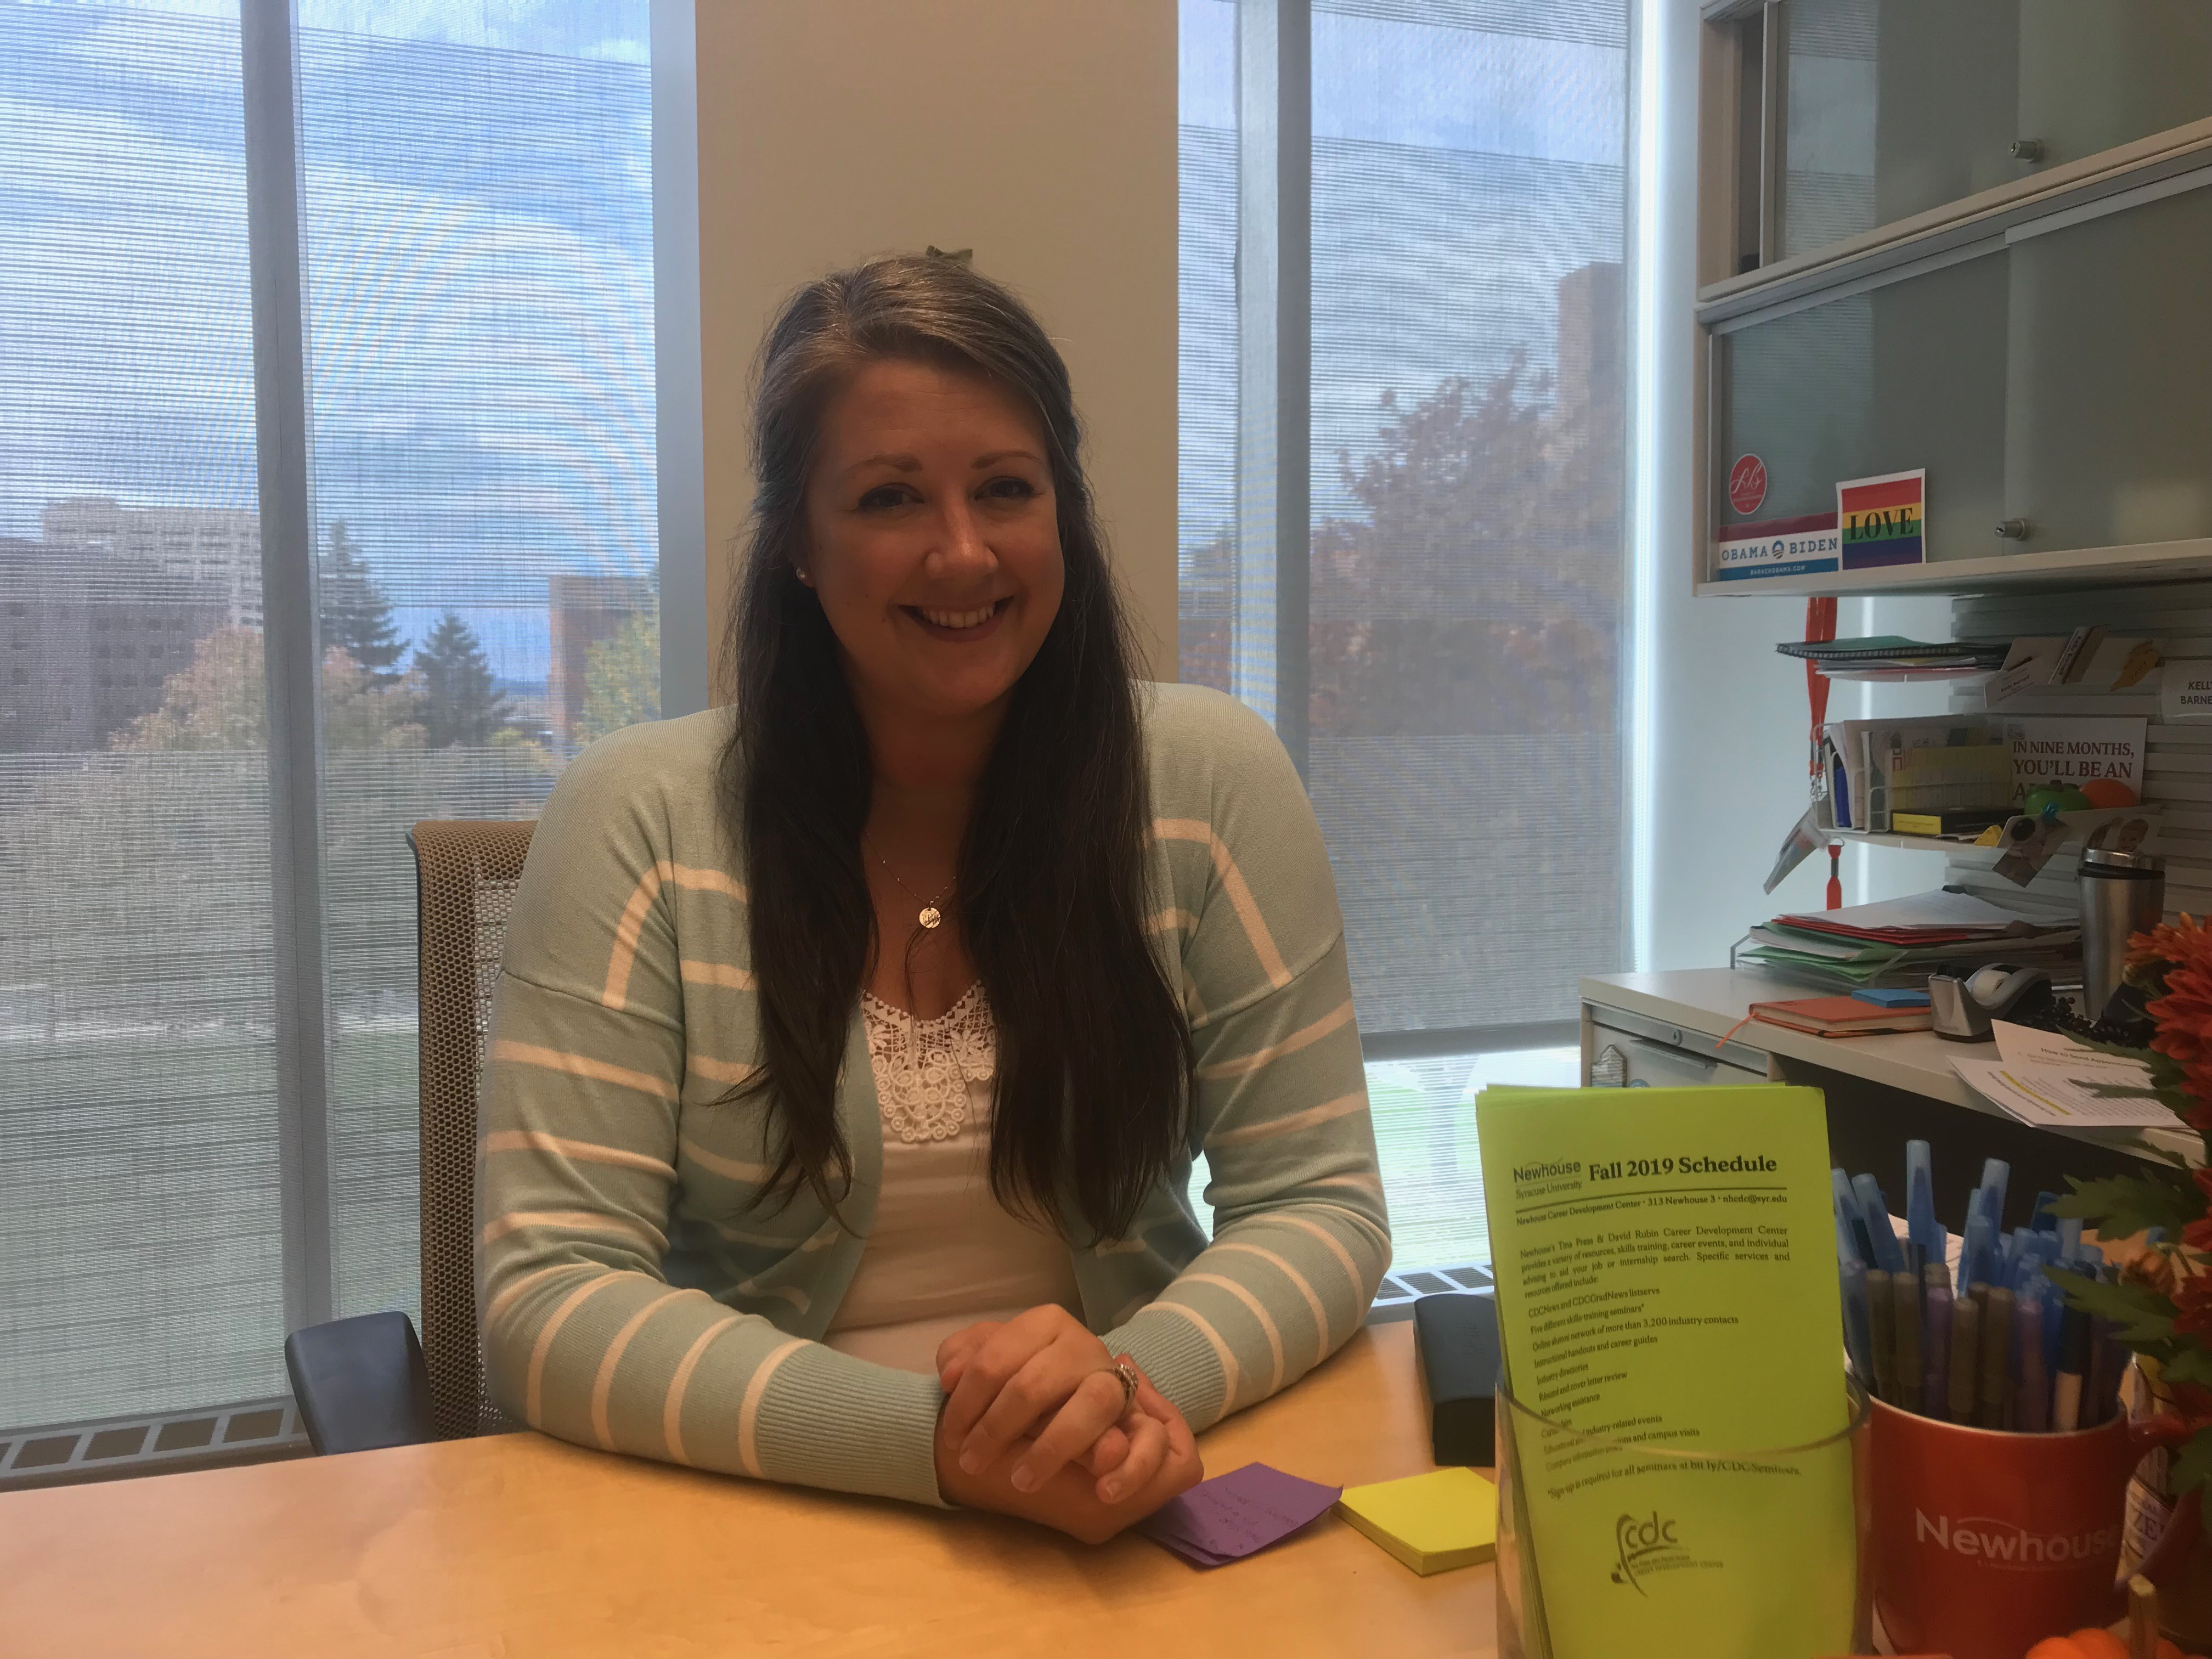 Kelly sits at desk